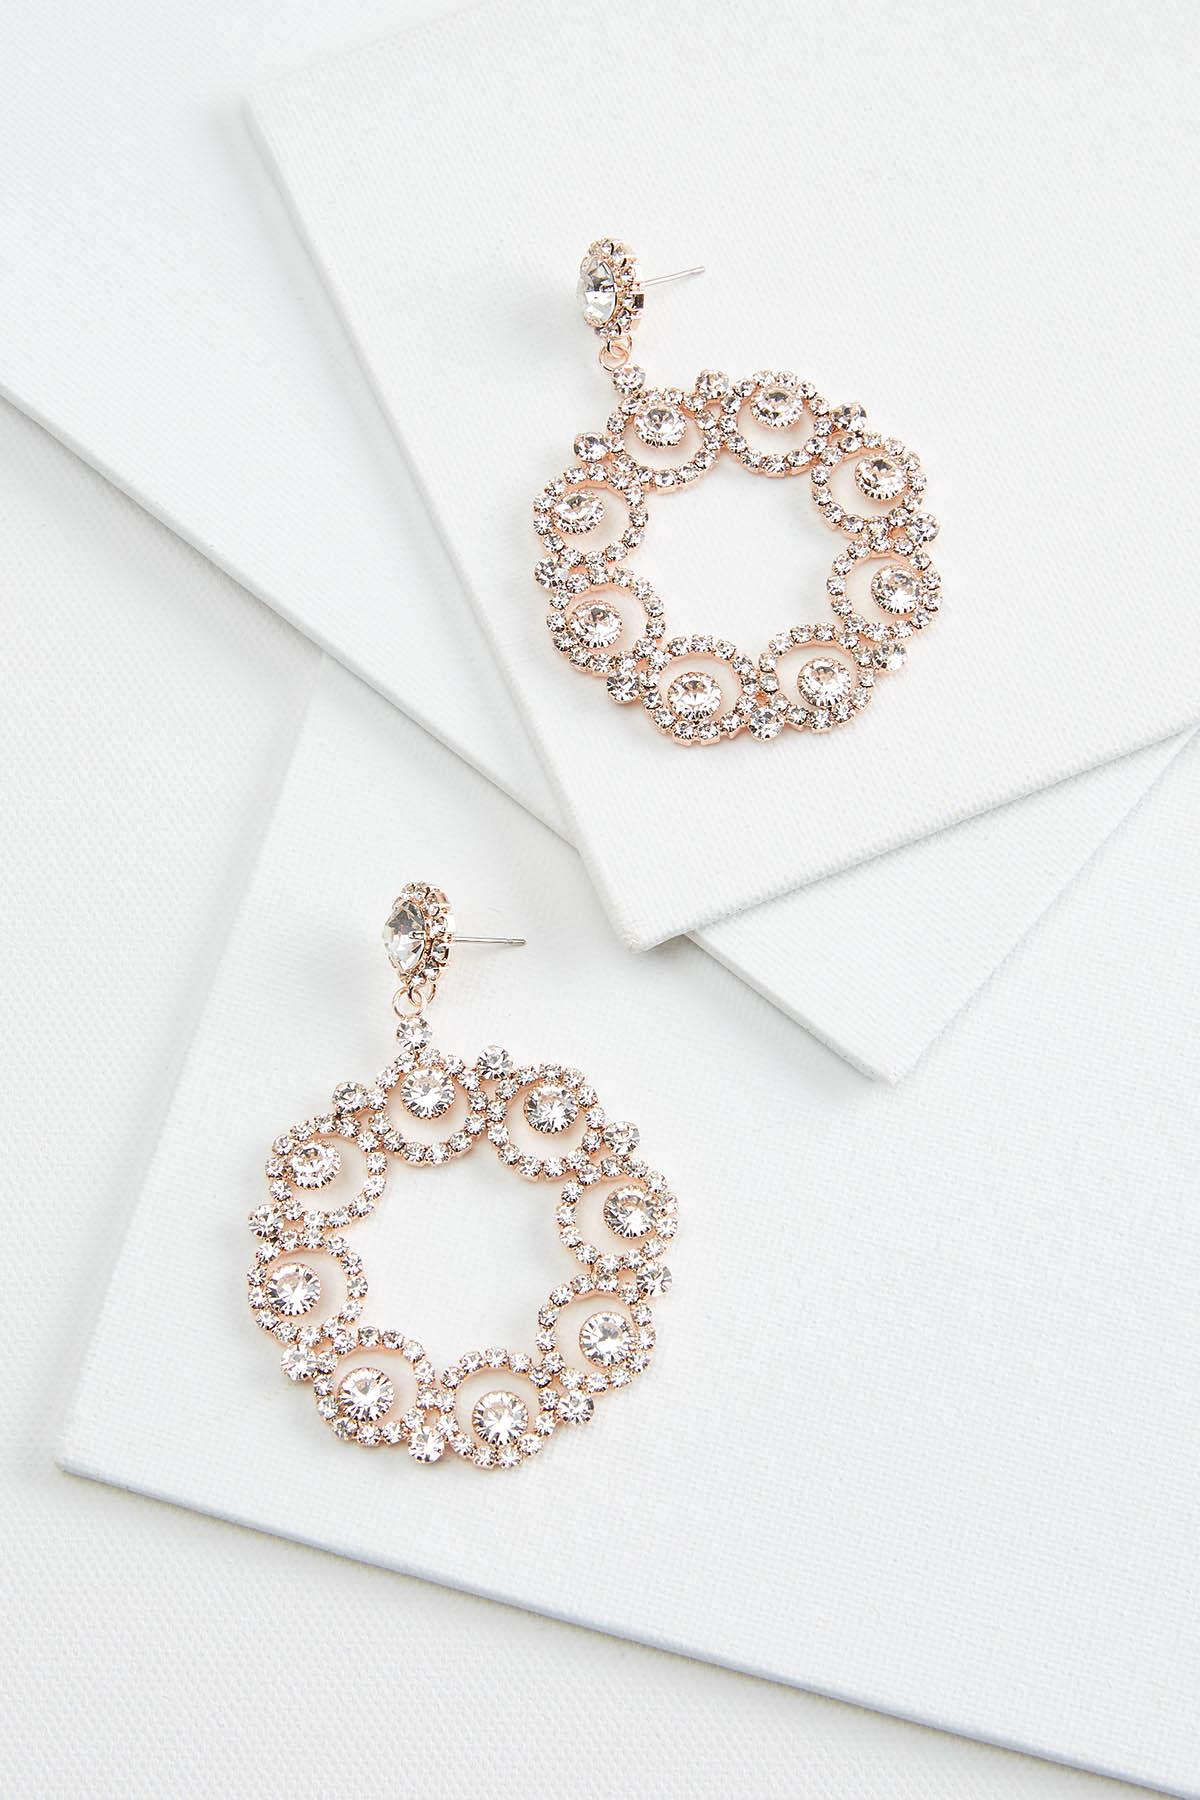 Glam Statement Earrings